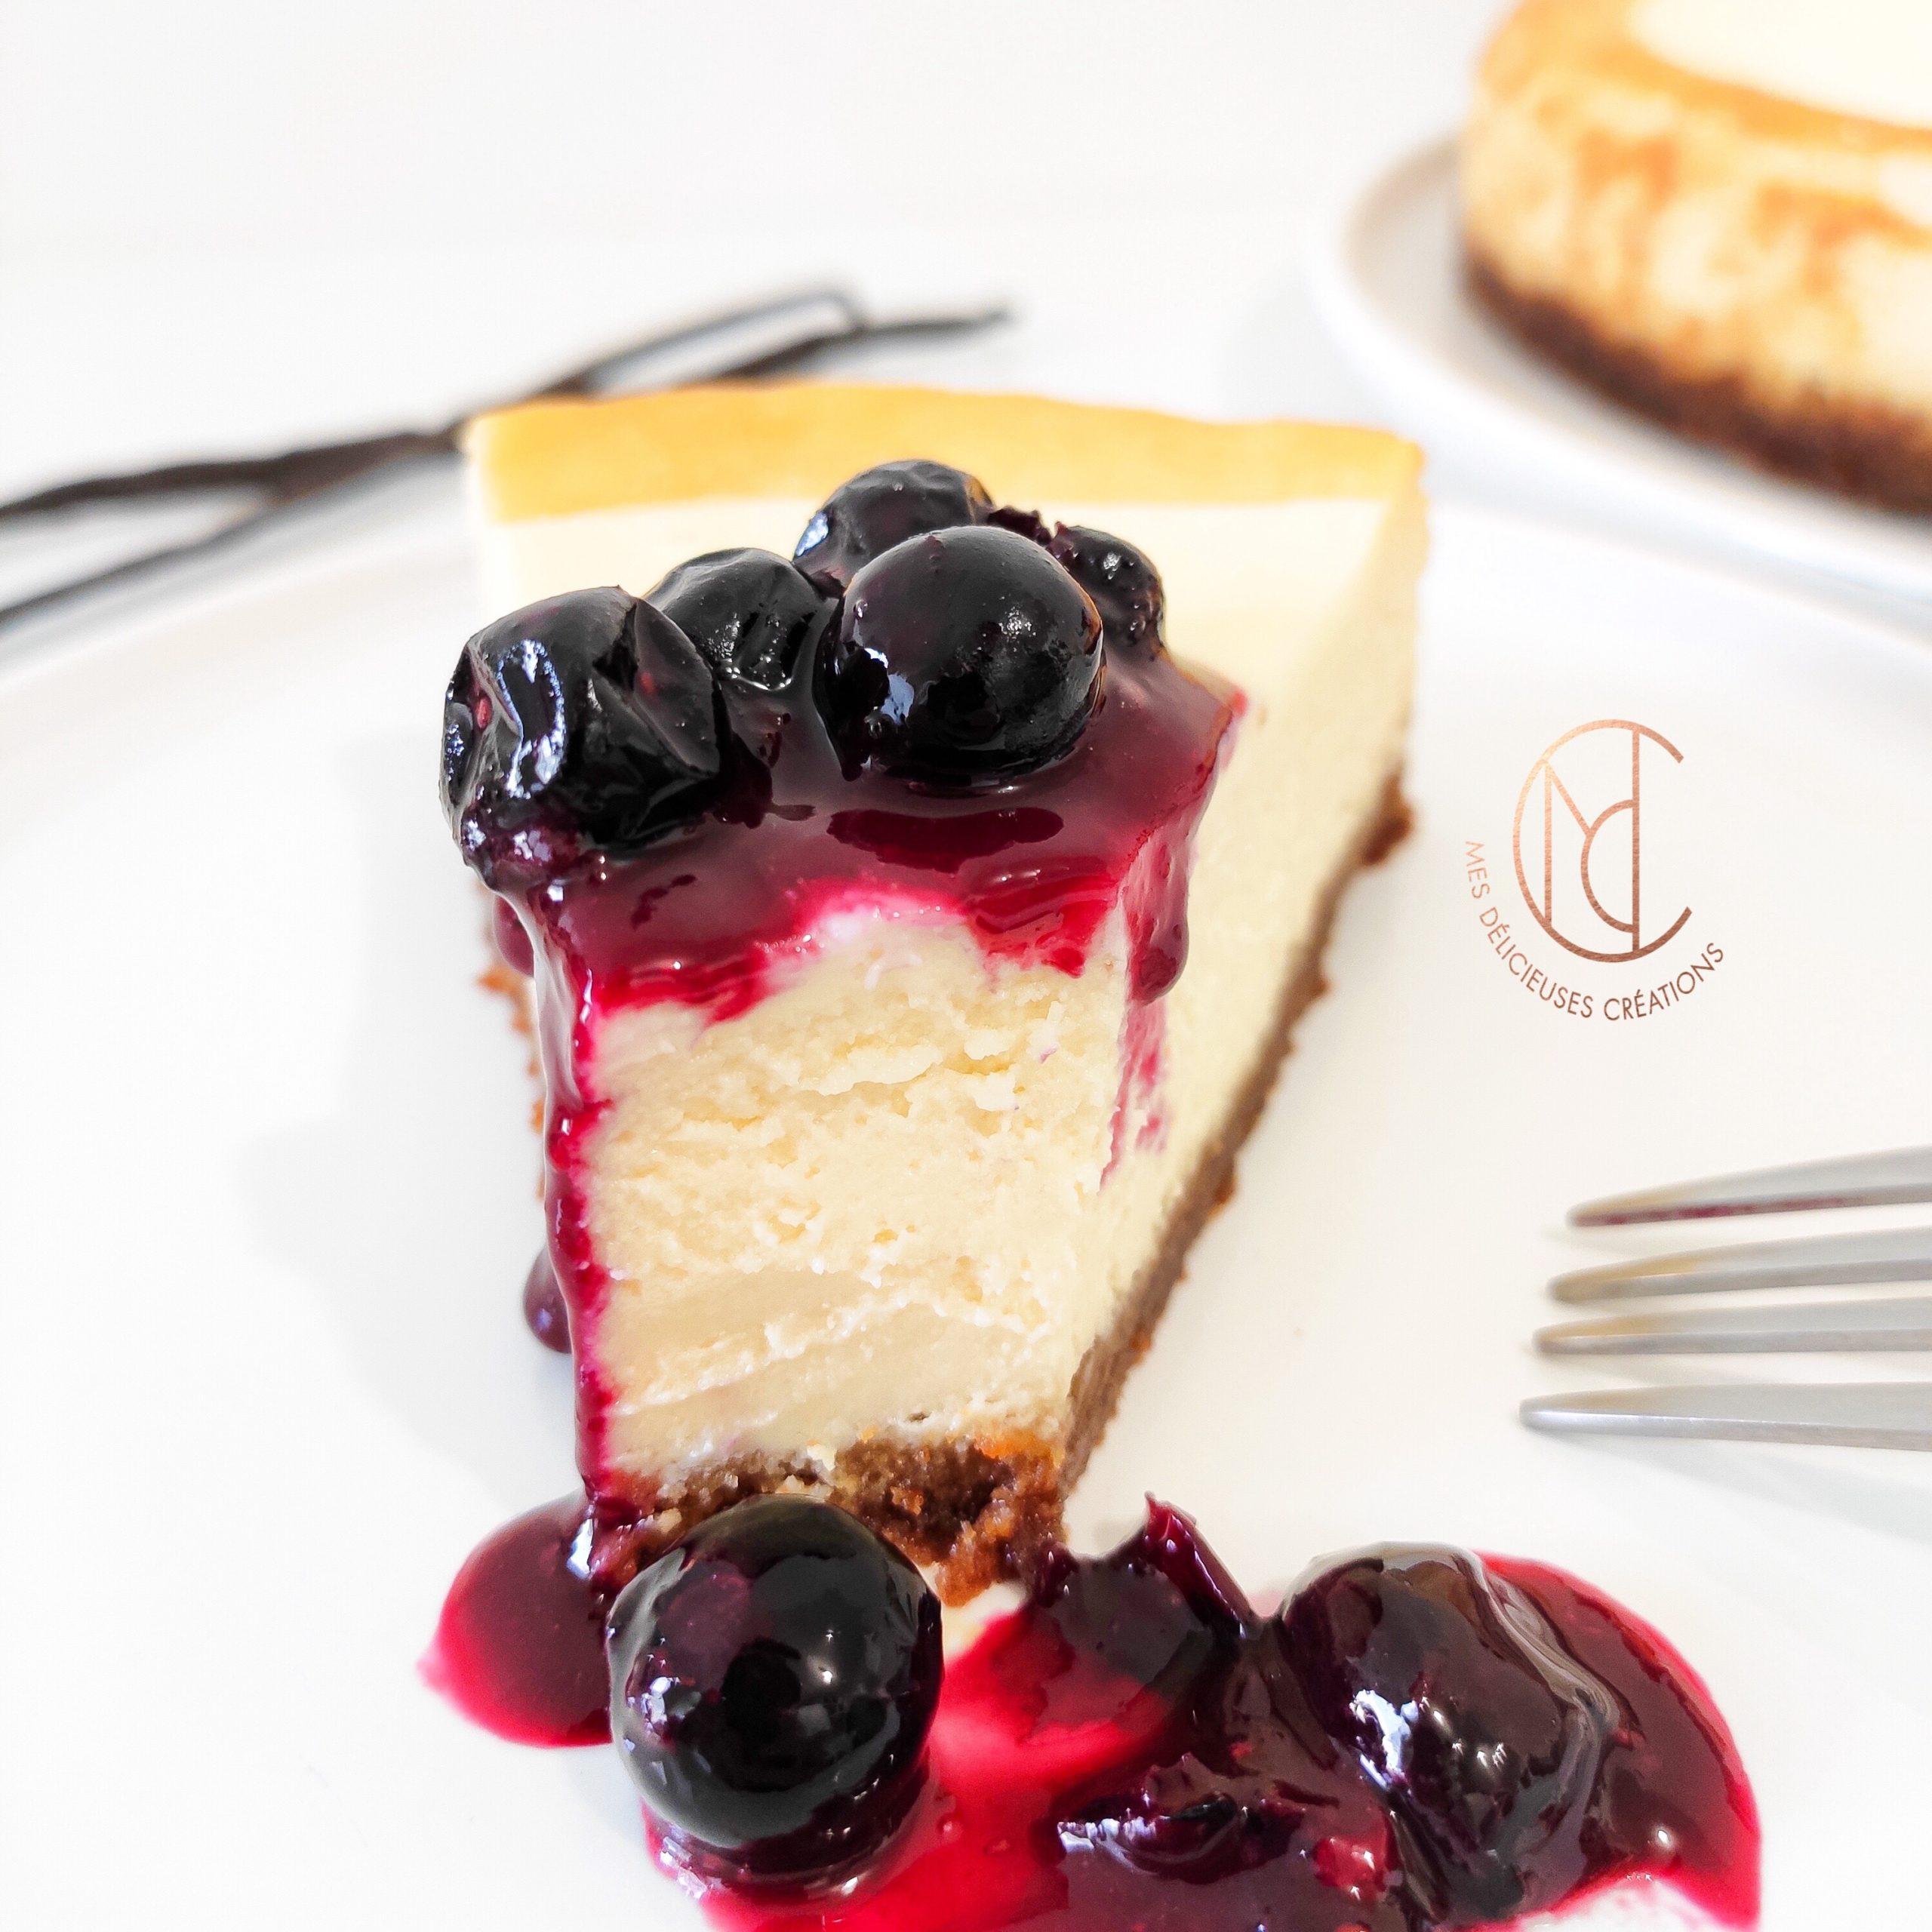 cheesecake façon Starbucks